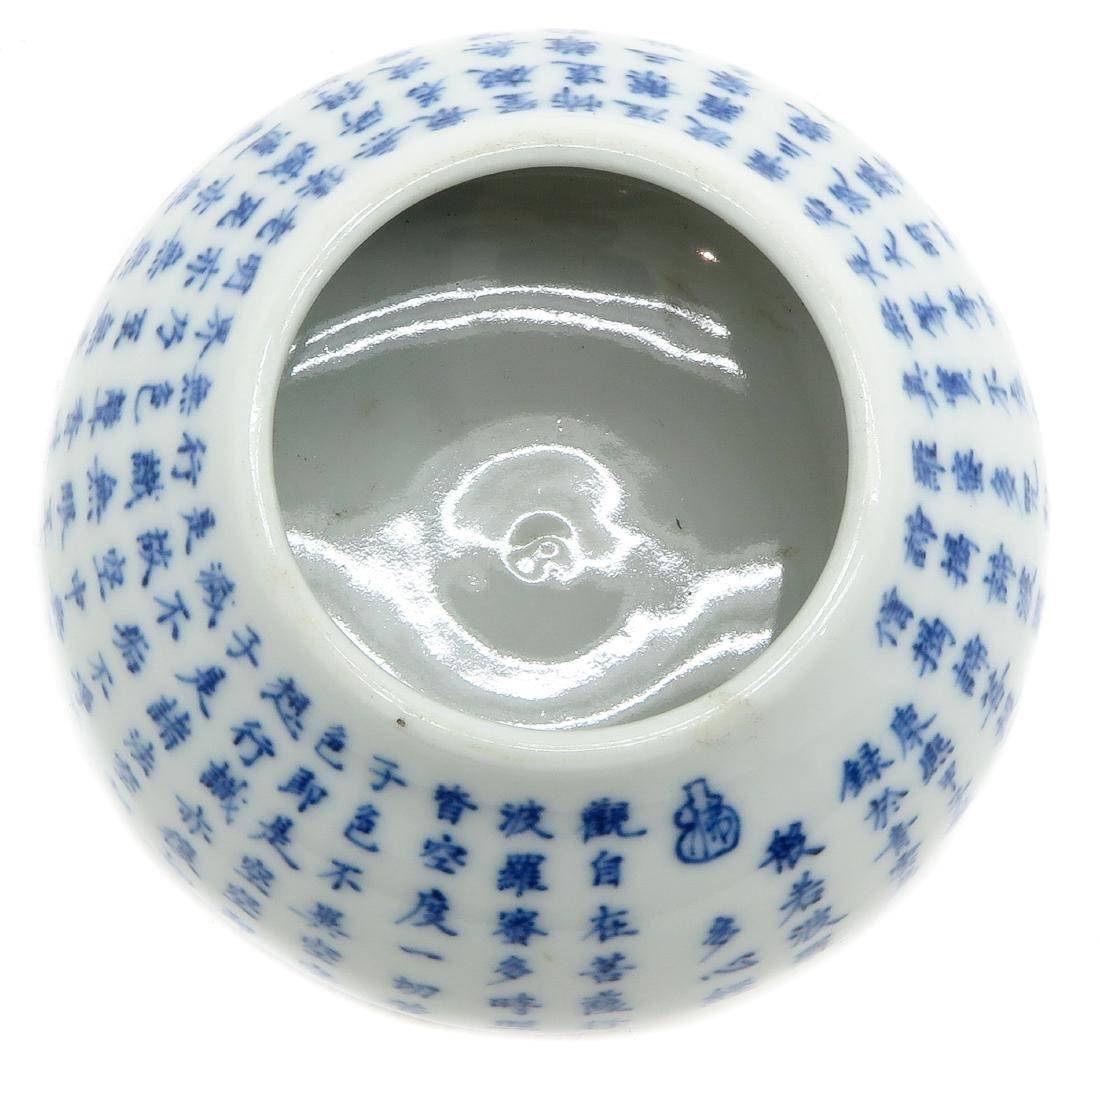 Small Vase - 4